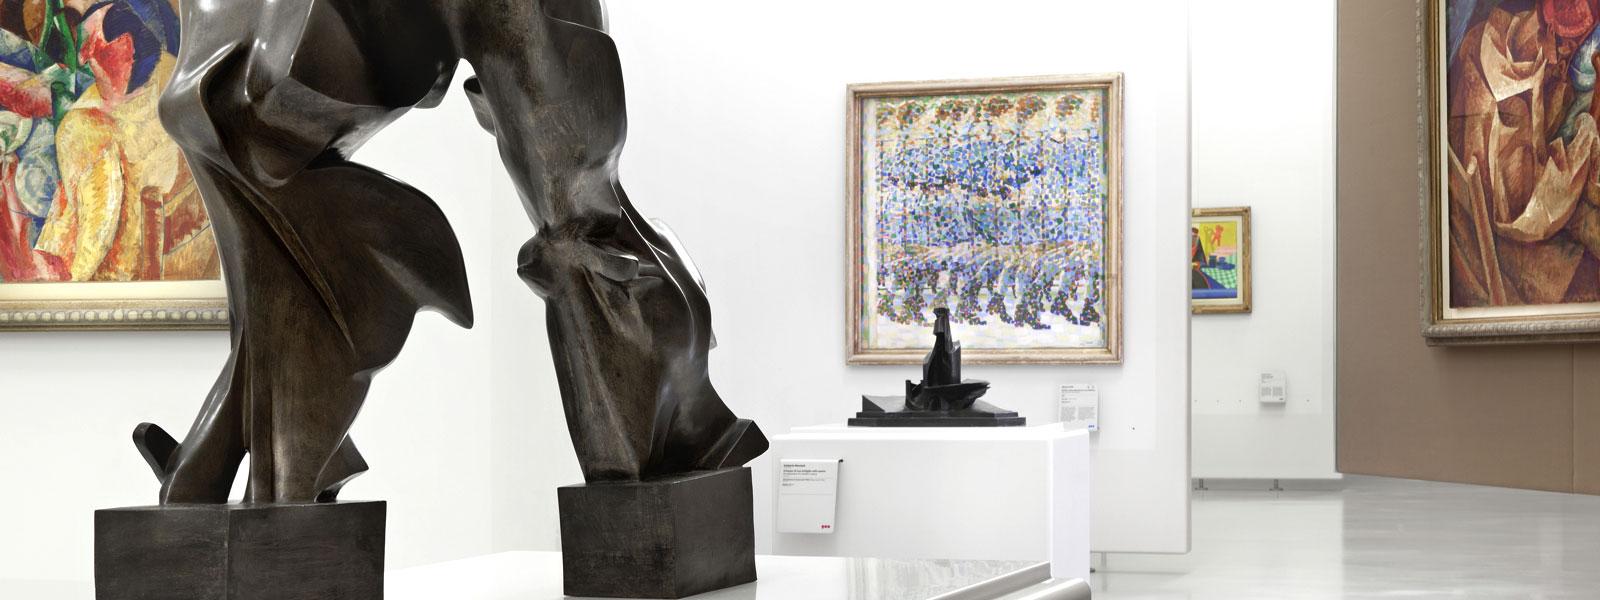 museo 900 milano opere